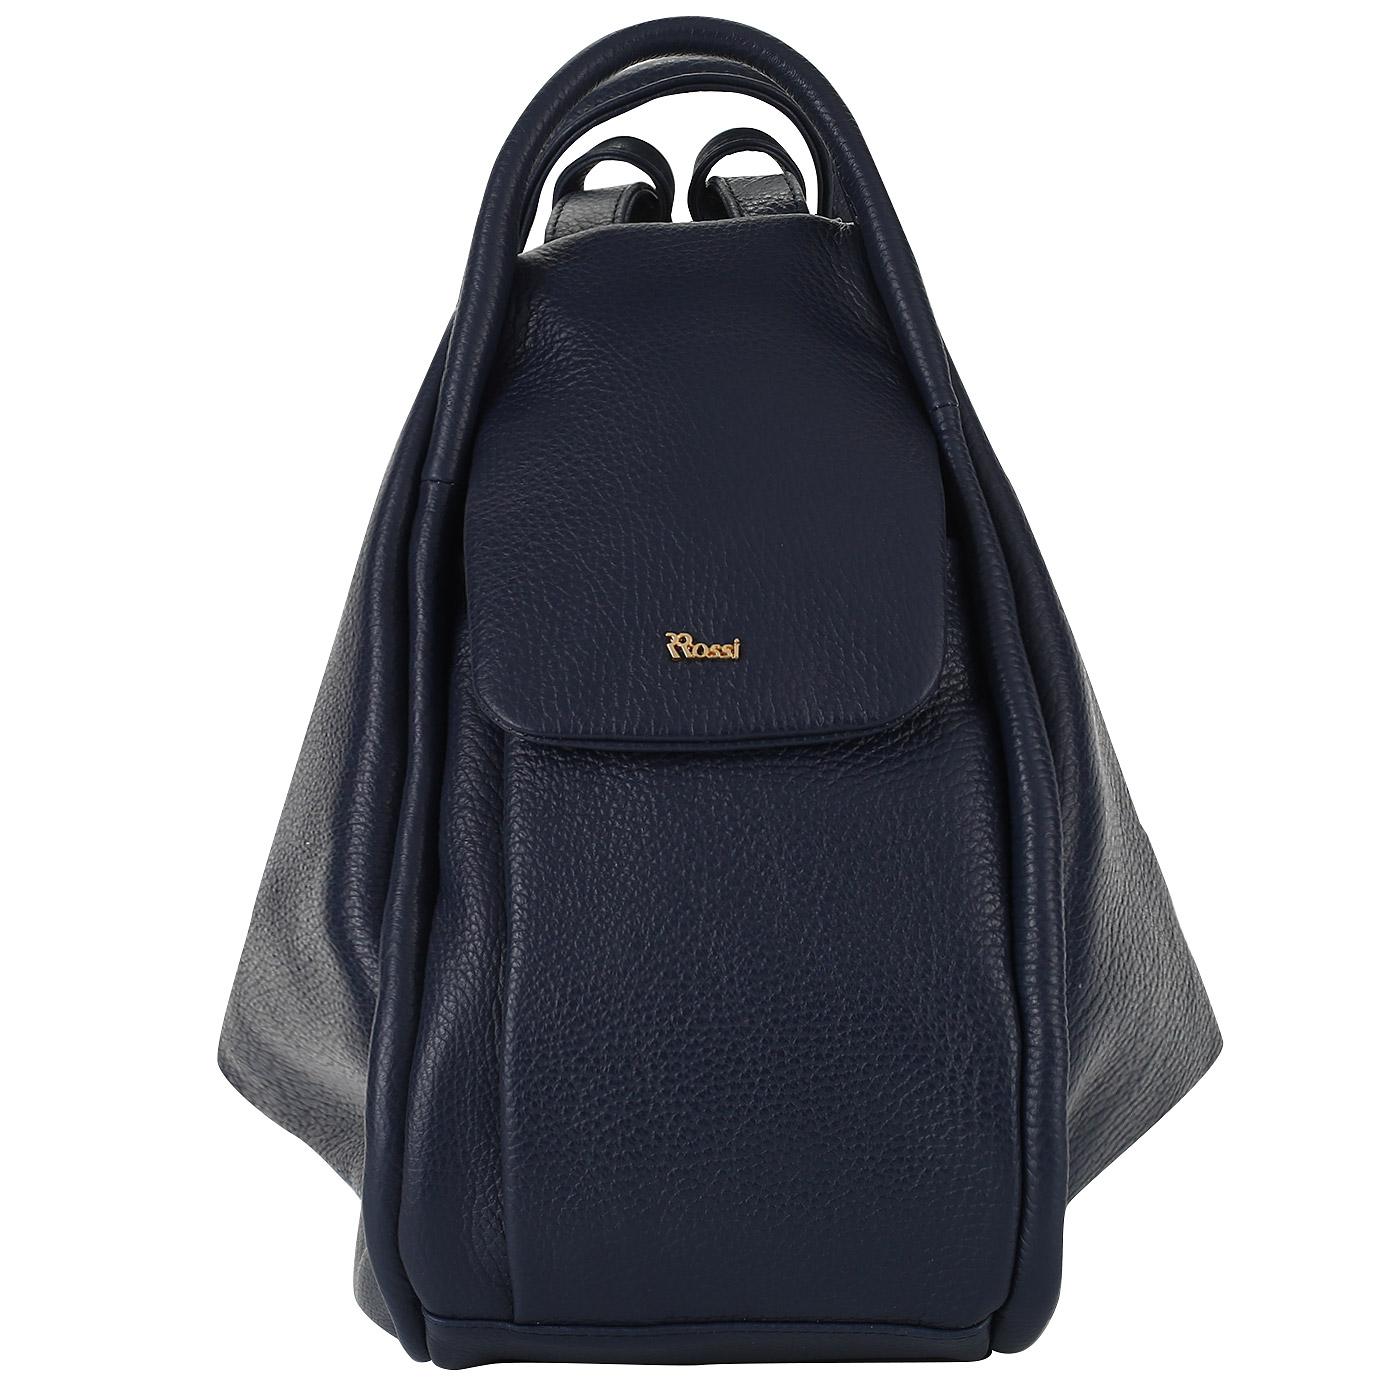 76c4b027f4a3 Женский кожаный рюкзак-трансформер Bruno Rossi MLX14_blu ...